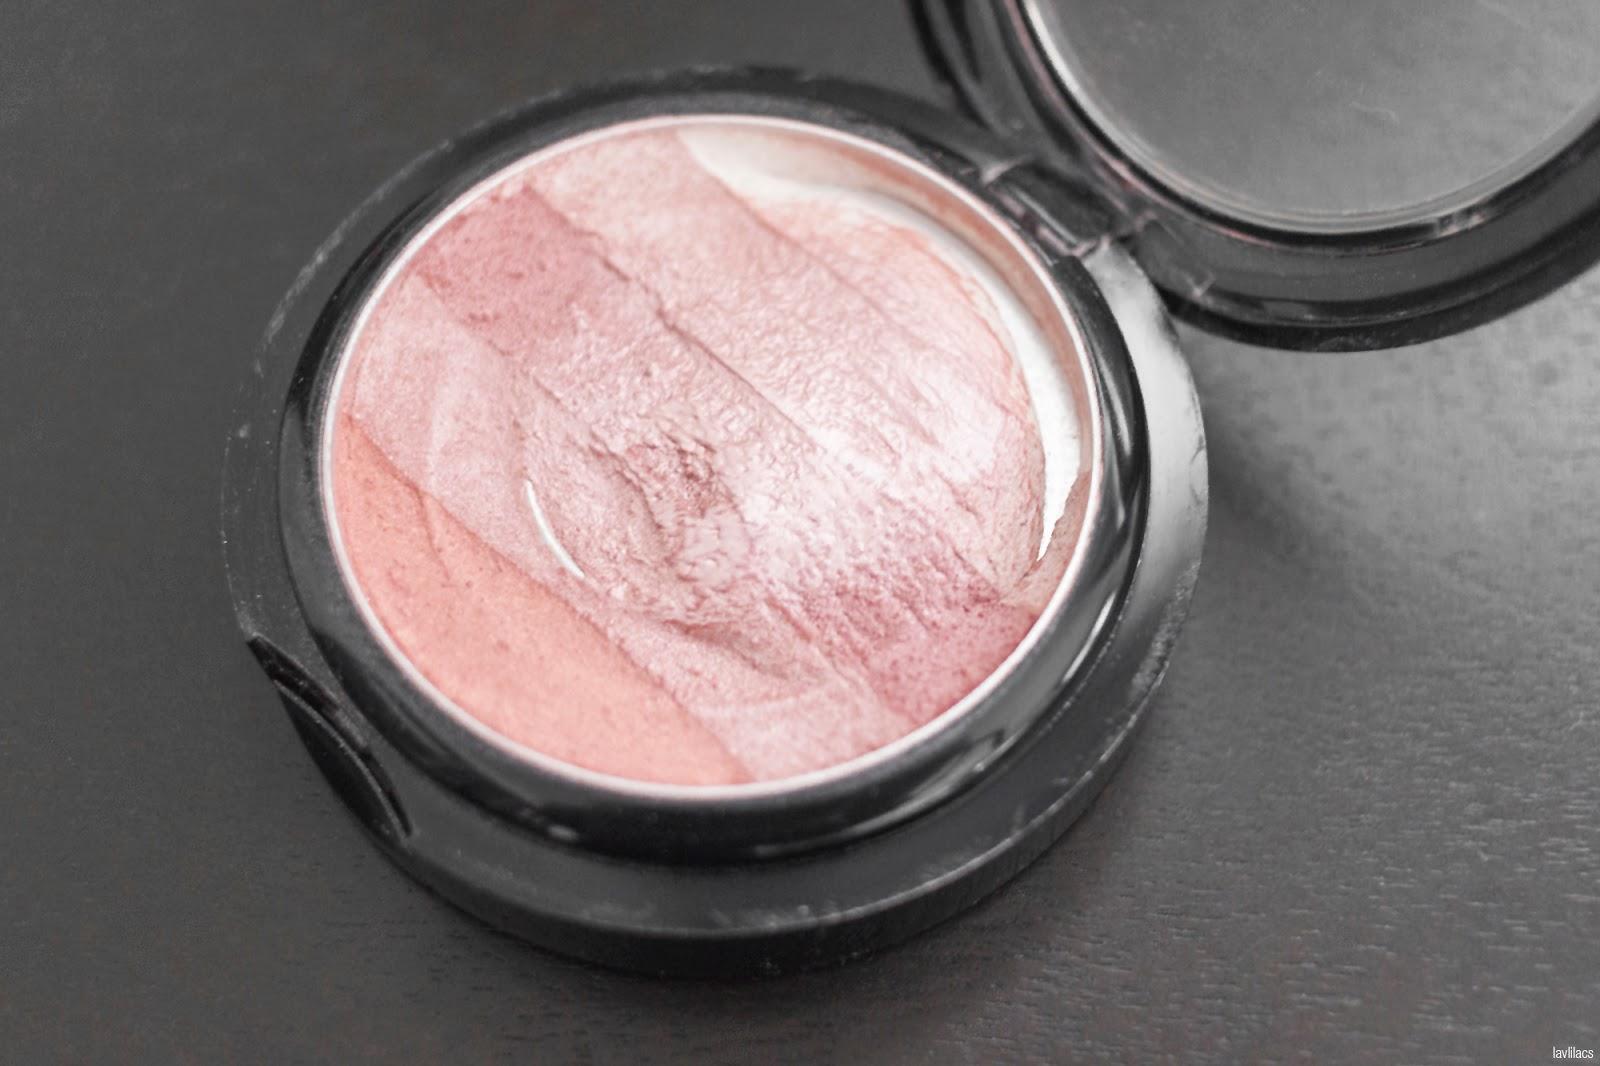 Project Make A Dent 2016 jane Shimmering Blush 01 Natural Blush - End results